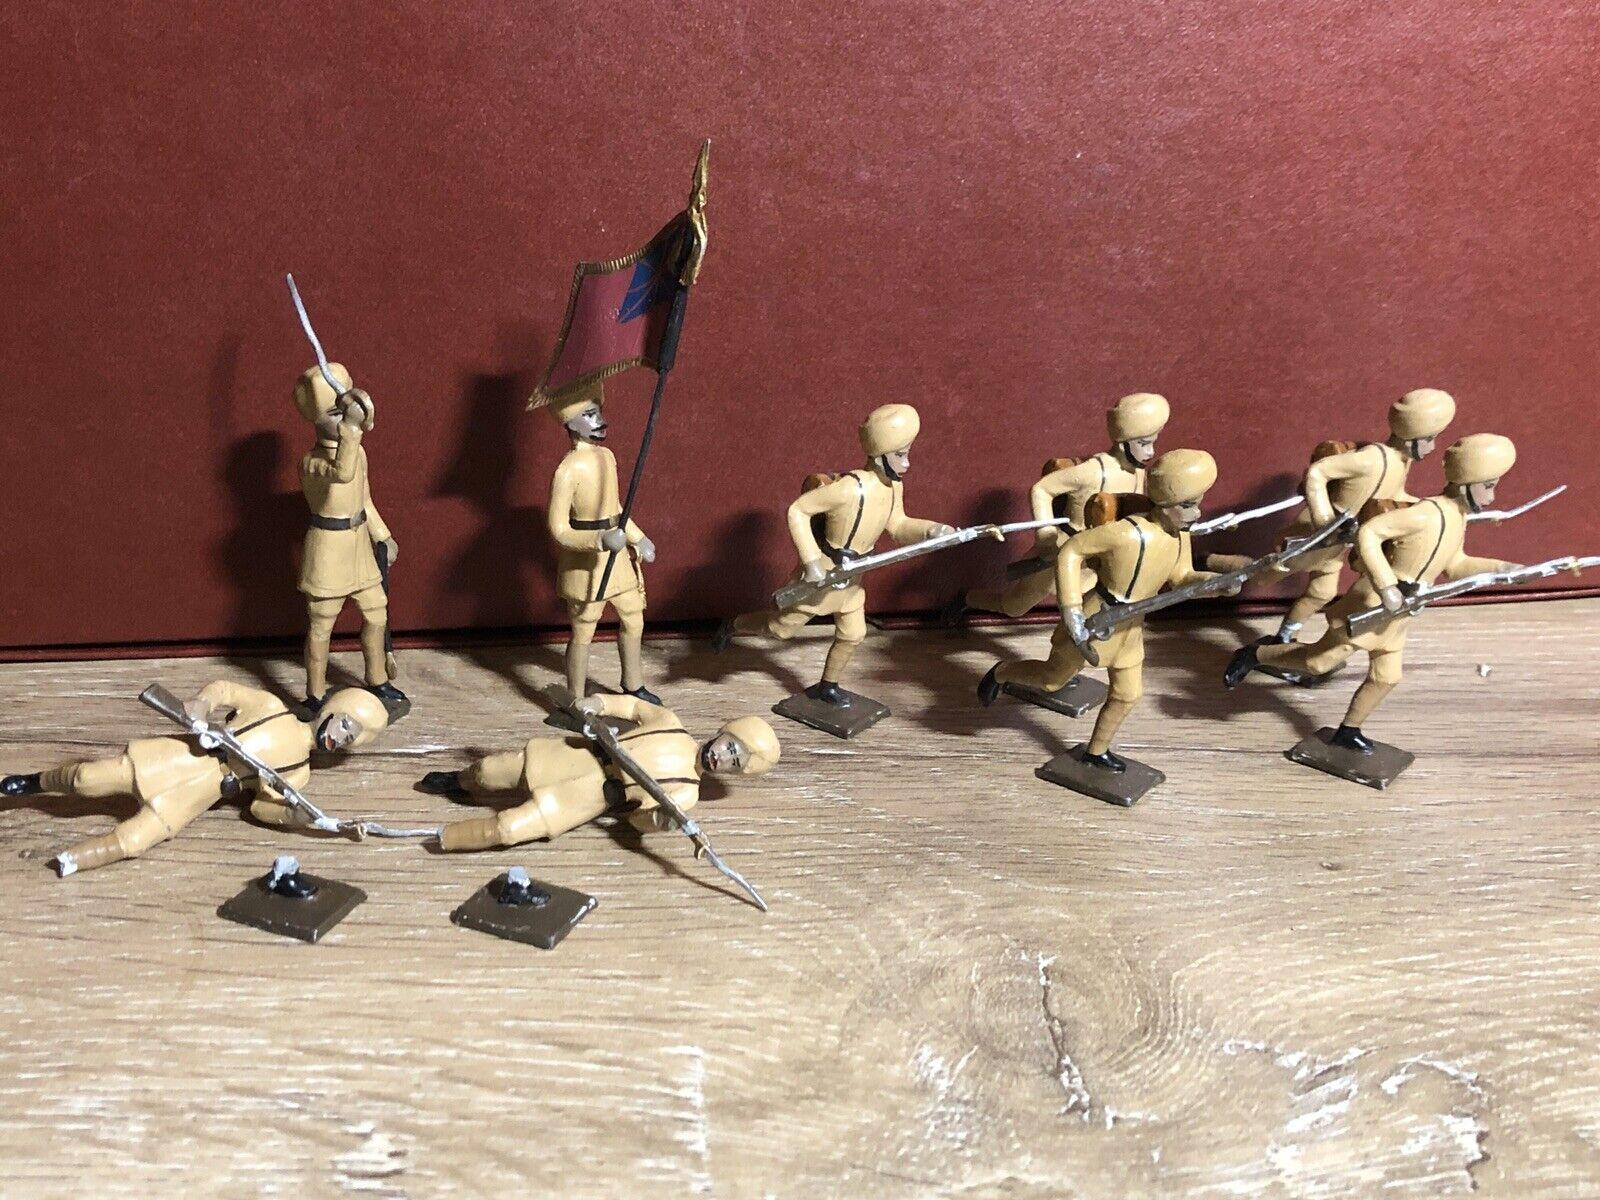 Cbg Mignot  Avanzato Punjab davantiiera Force Regiessit. Spedizione Postale Guerra